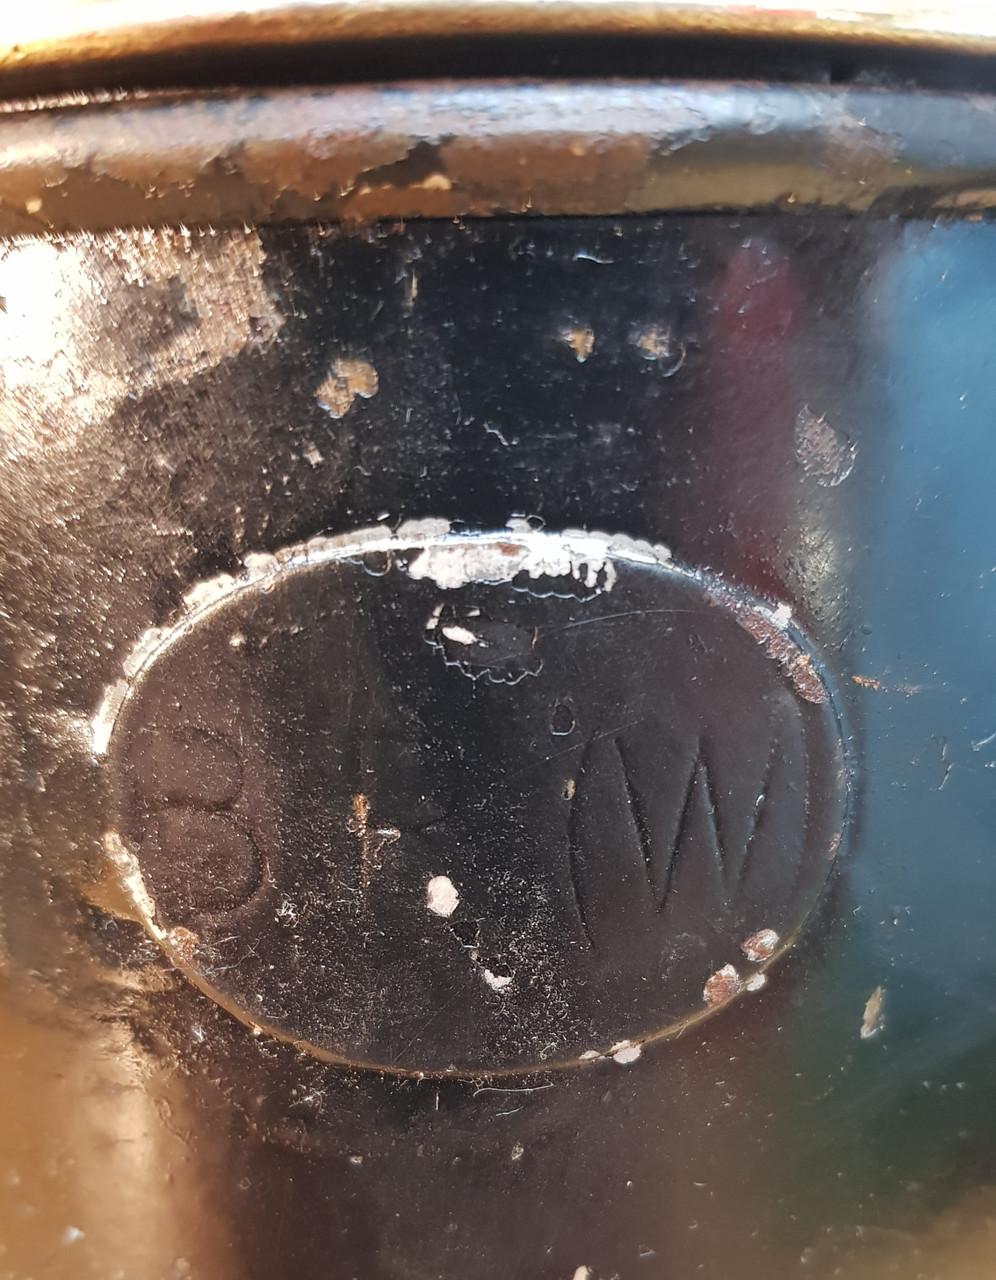 VT 3811. B.R  W.R.  4 ASPECT SIGNAL BOX HANDLAMP.